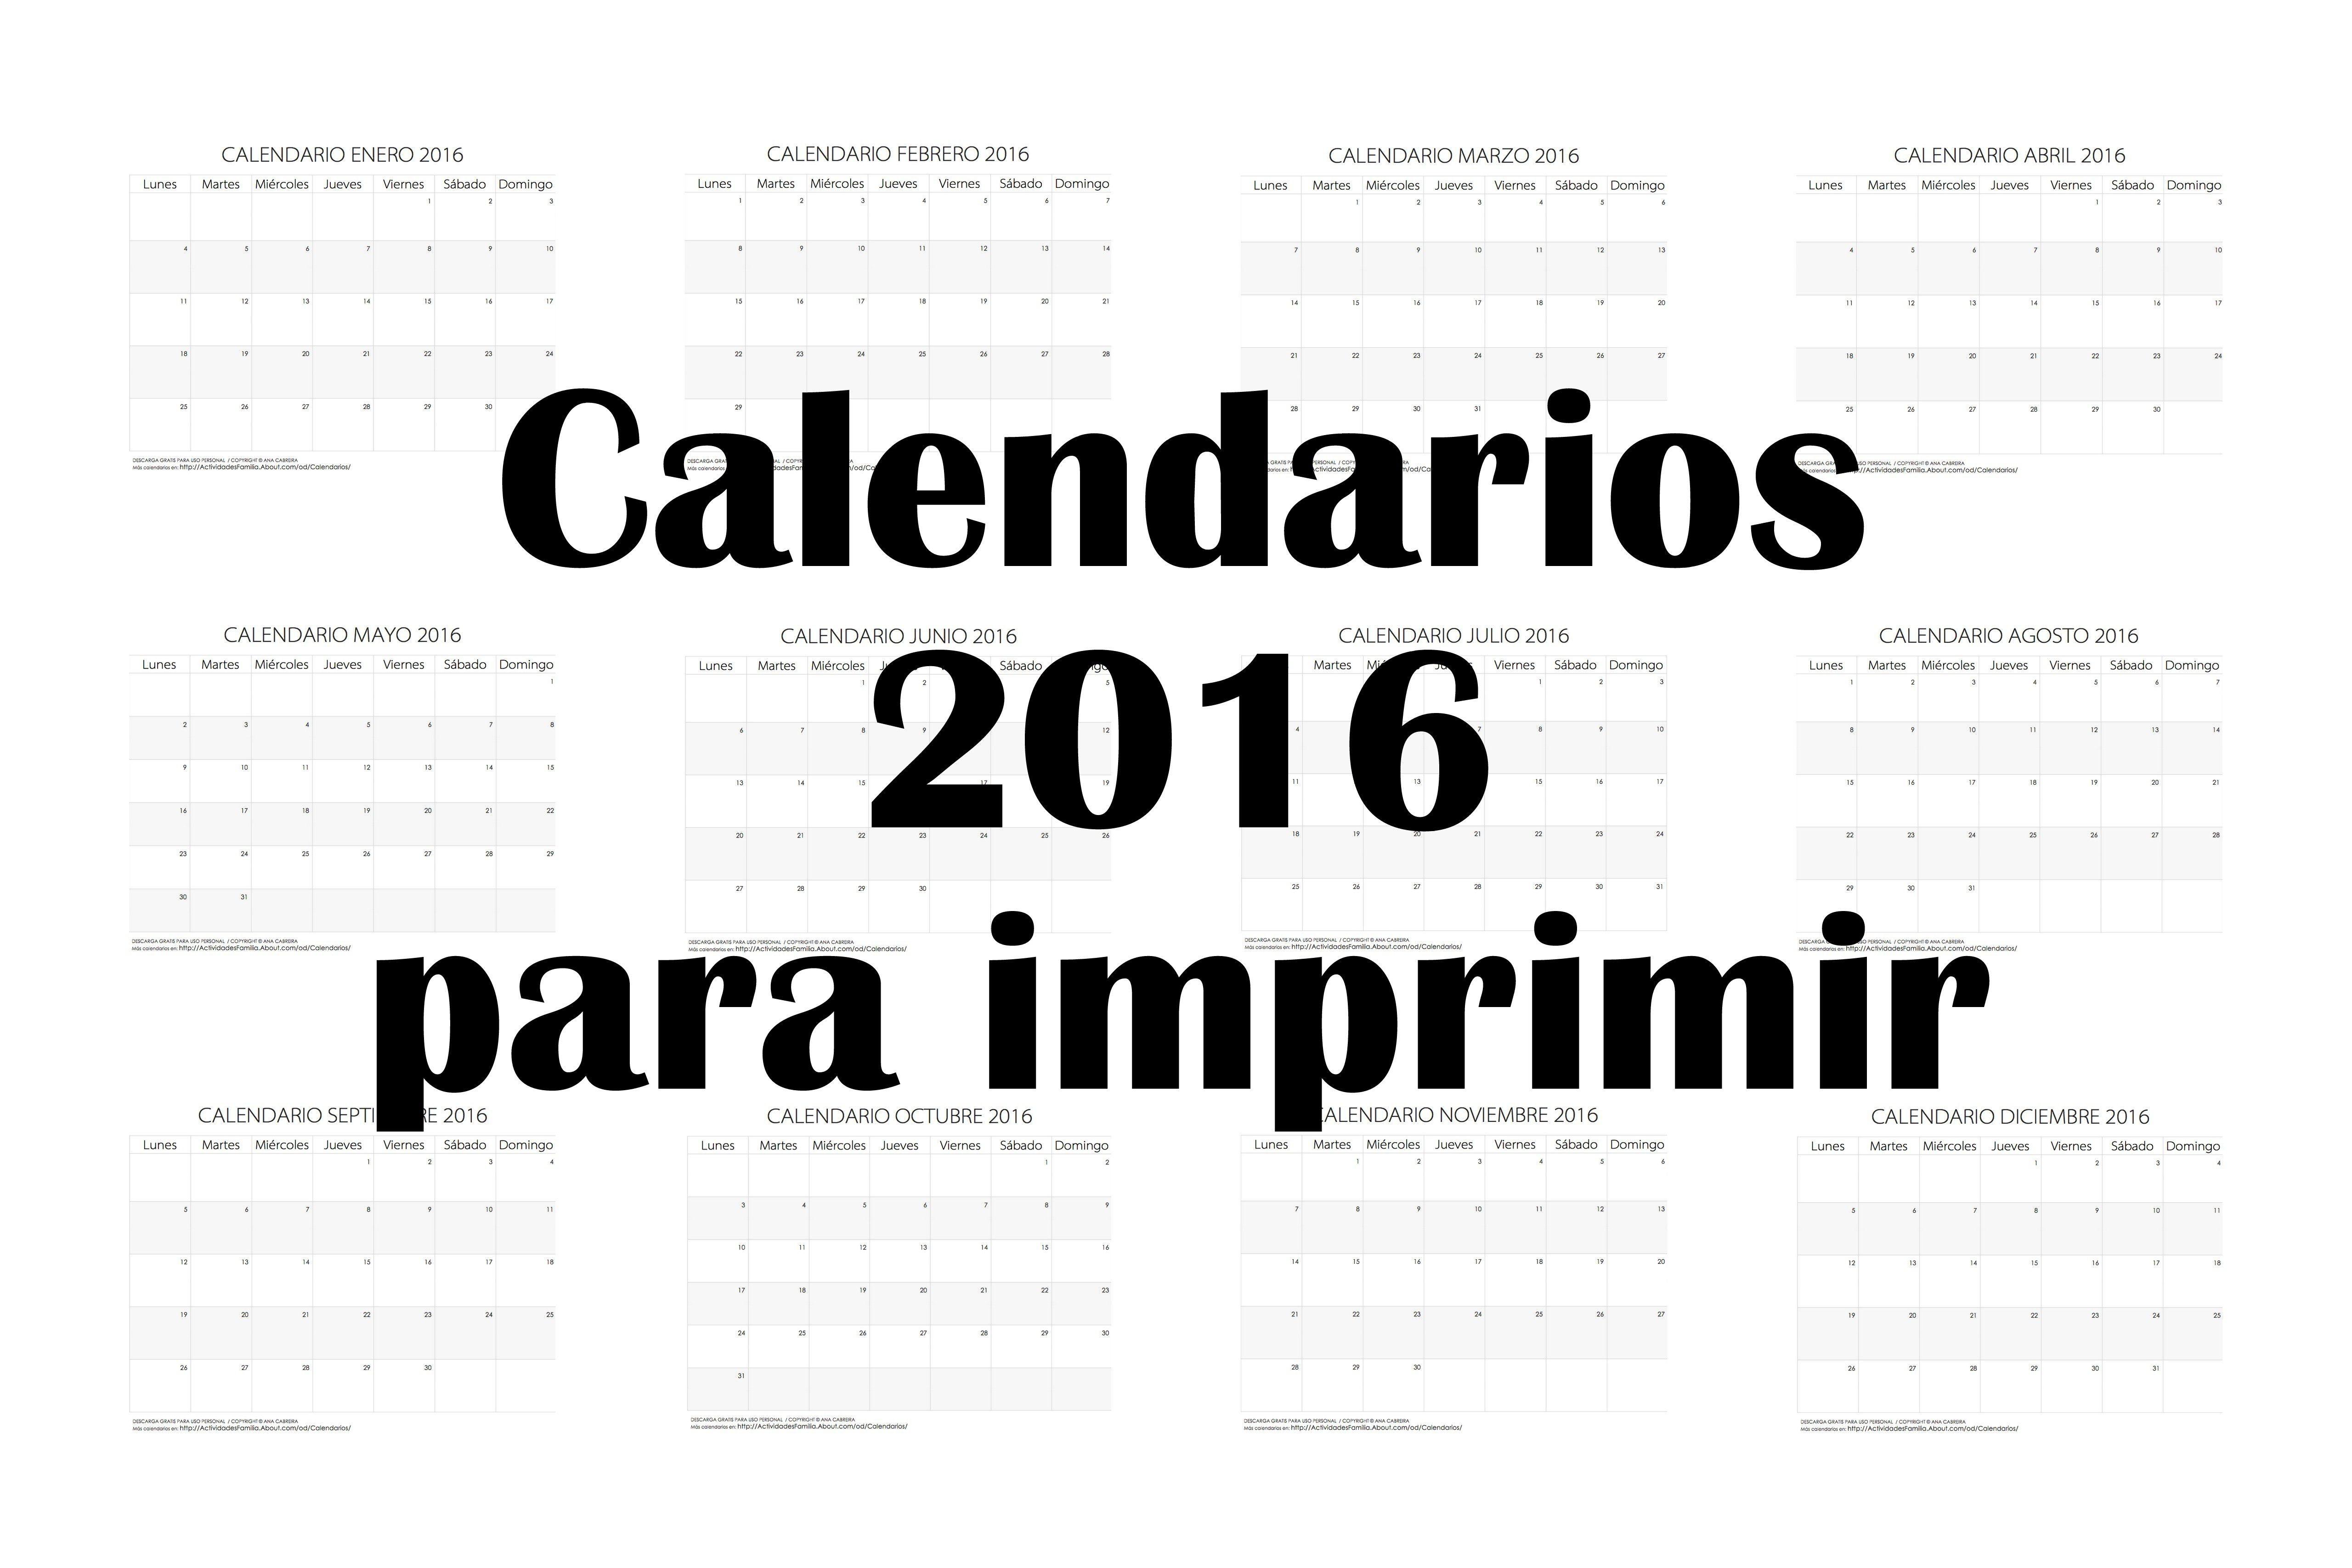 calendarios 2016 569fd0aa5f9b58eba4ad4f8a